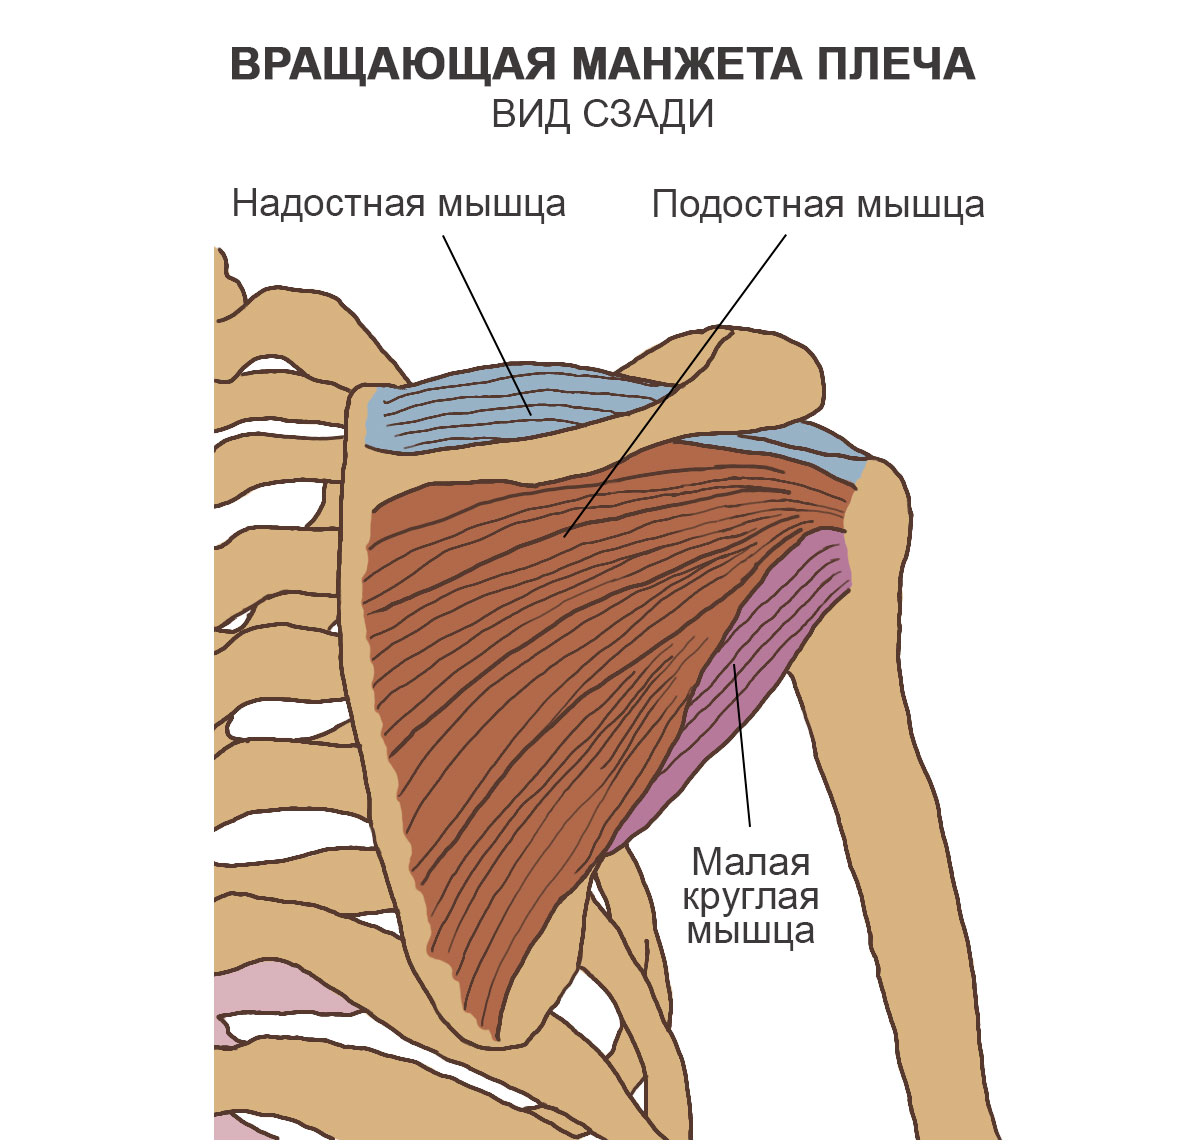 Вращающая манжета плеча, вид сзади